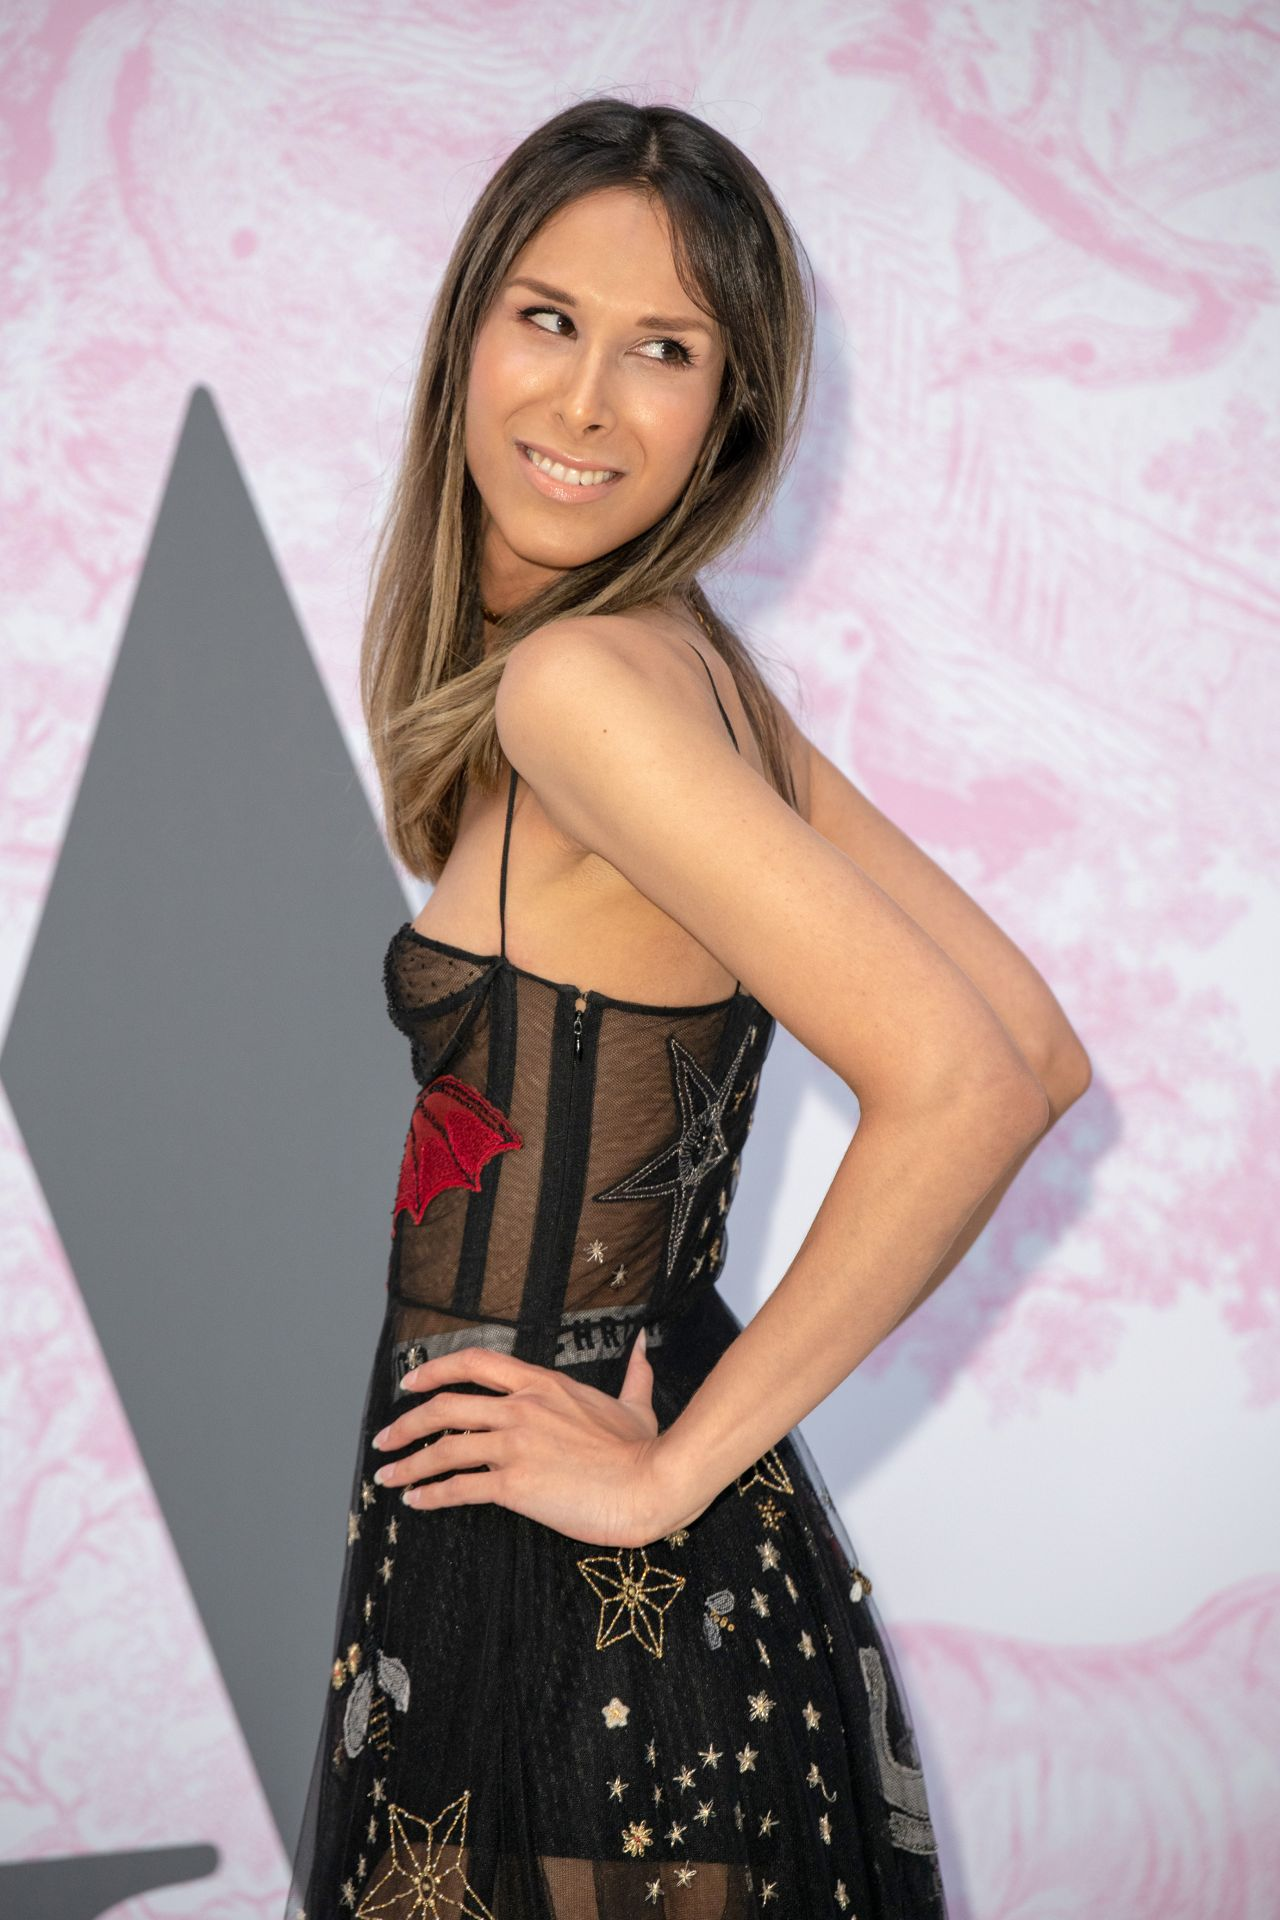 Permalink to Isabella Charlotta Poppius At Va Summer Party In London